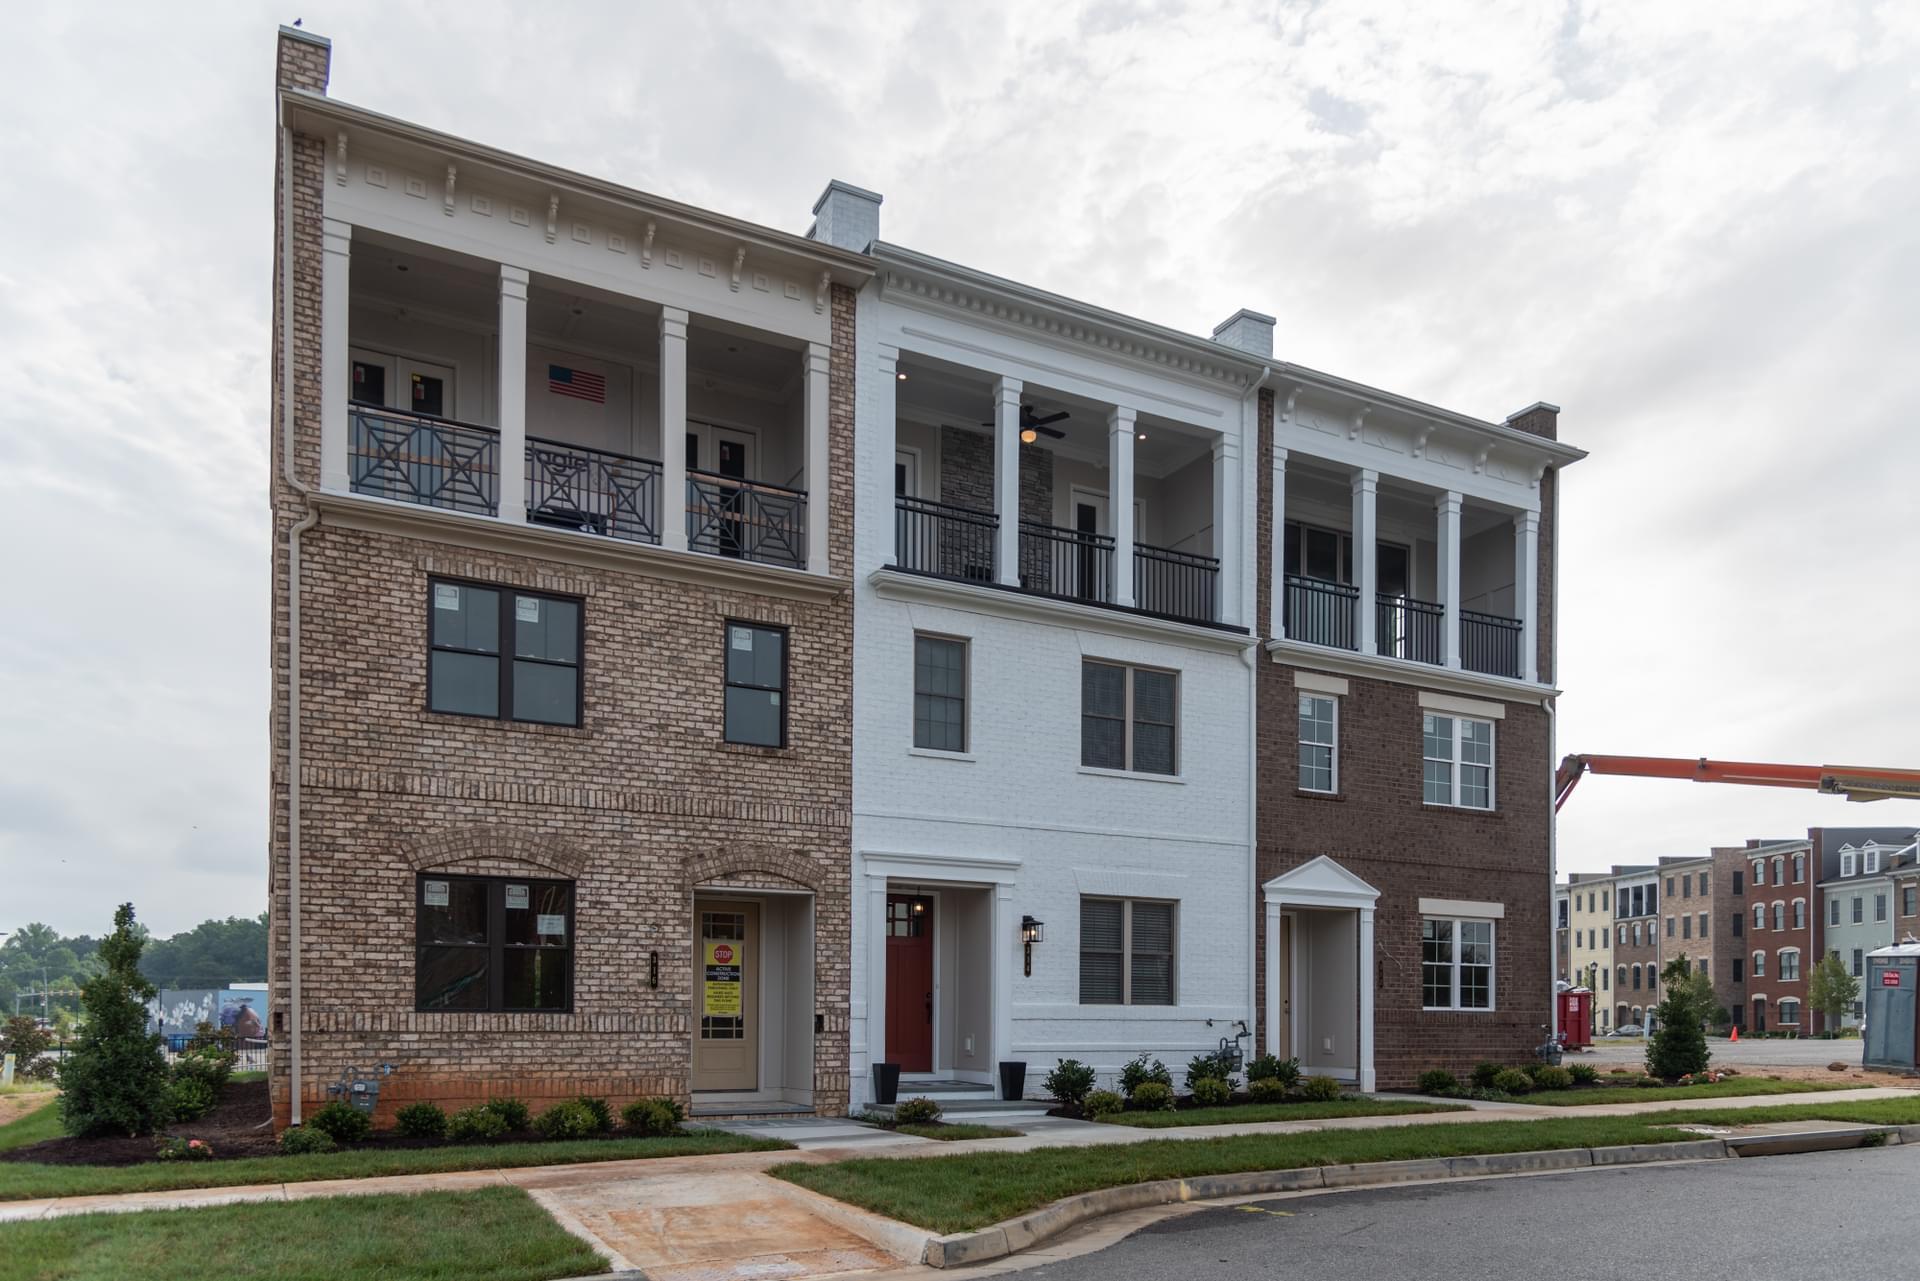 The Davenport New Home Floorplan